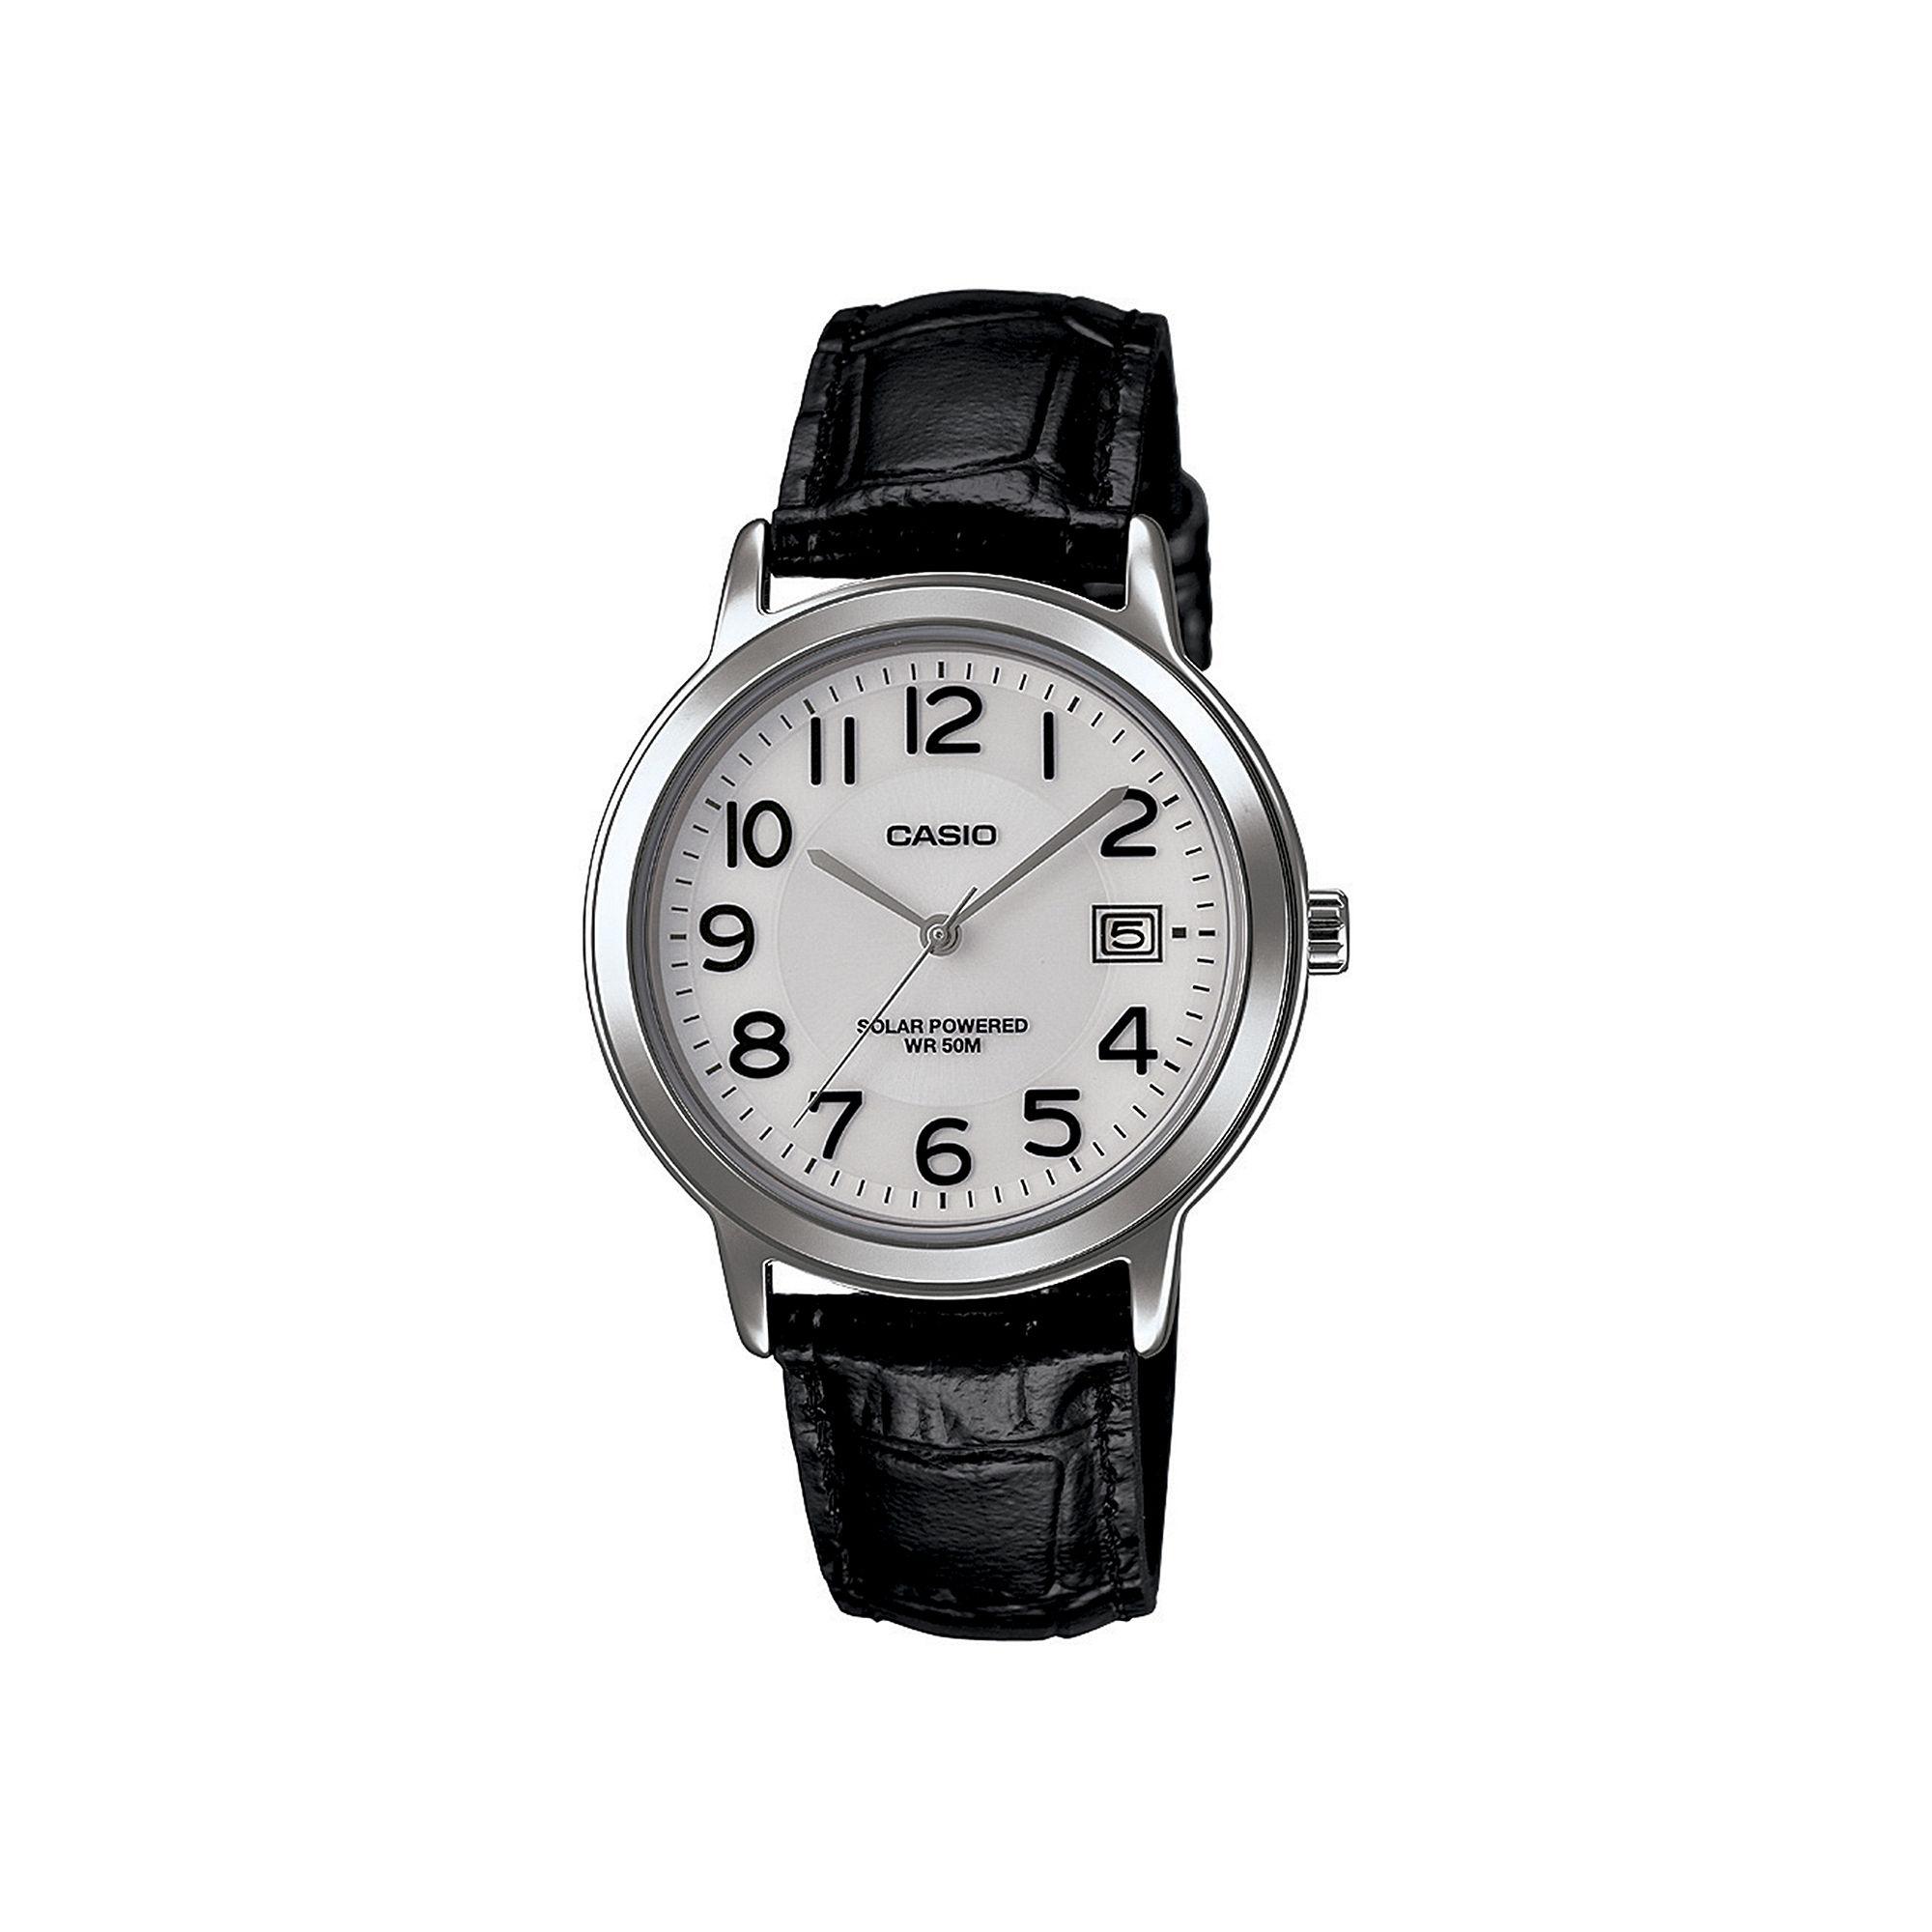 Casio Mens Black Leather Strap Solar Watch MTPS100L-7B1